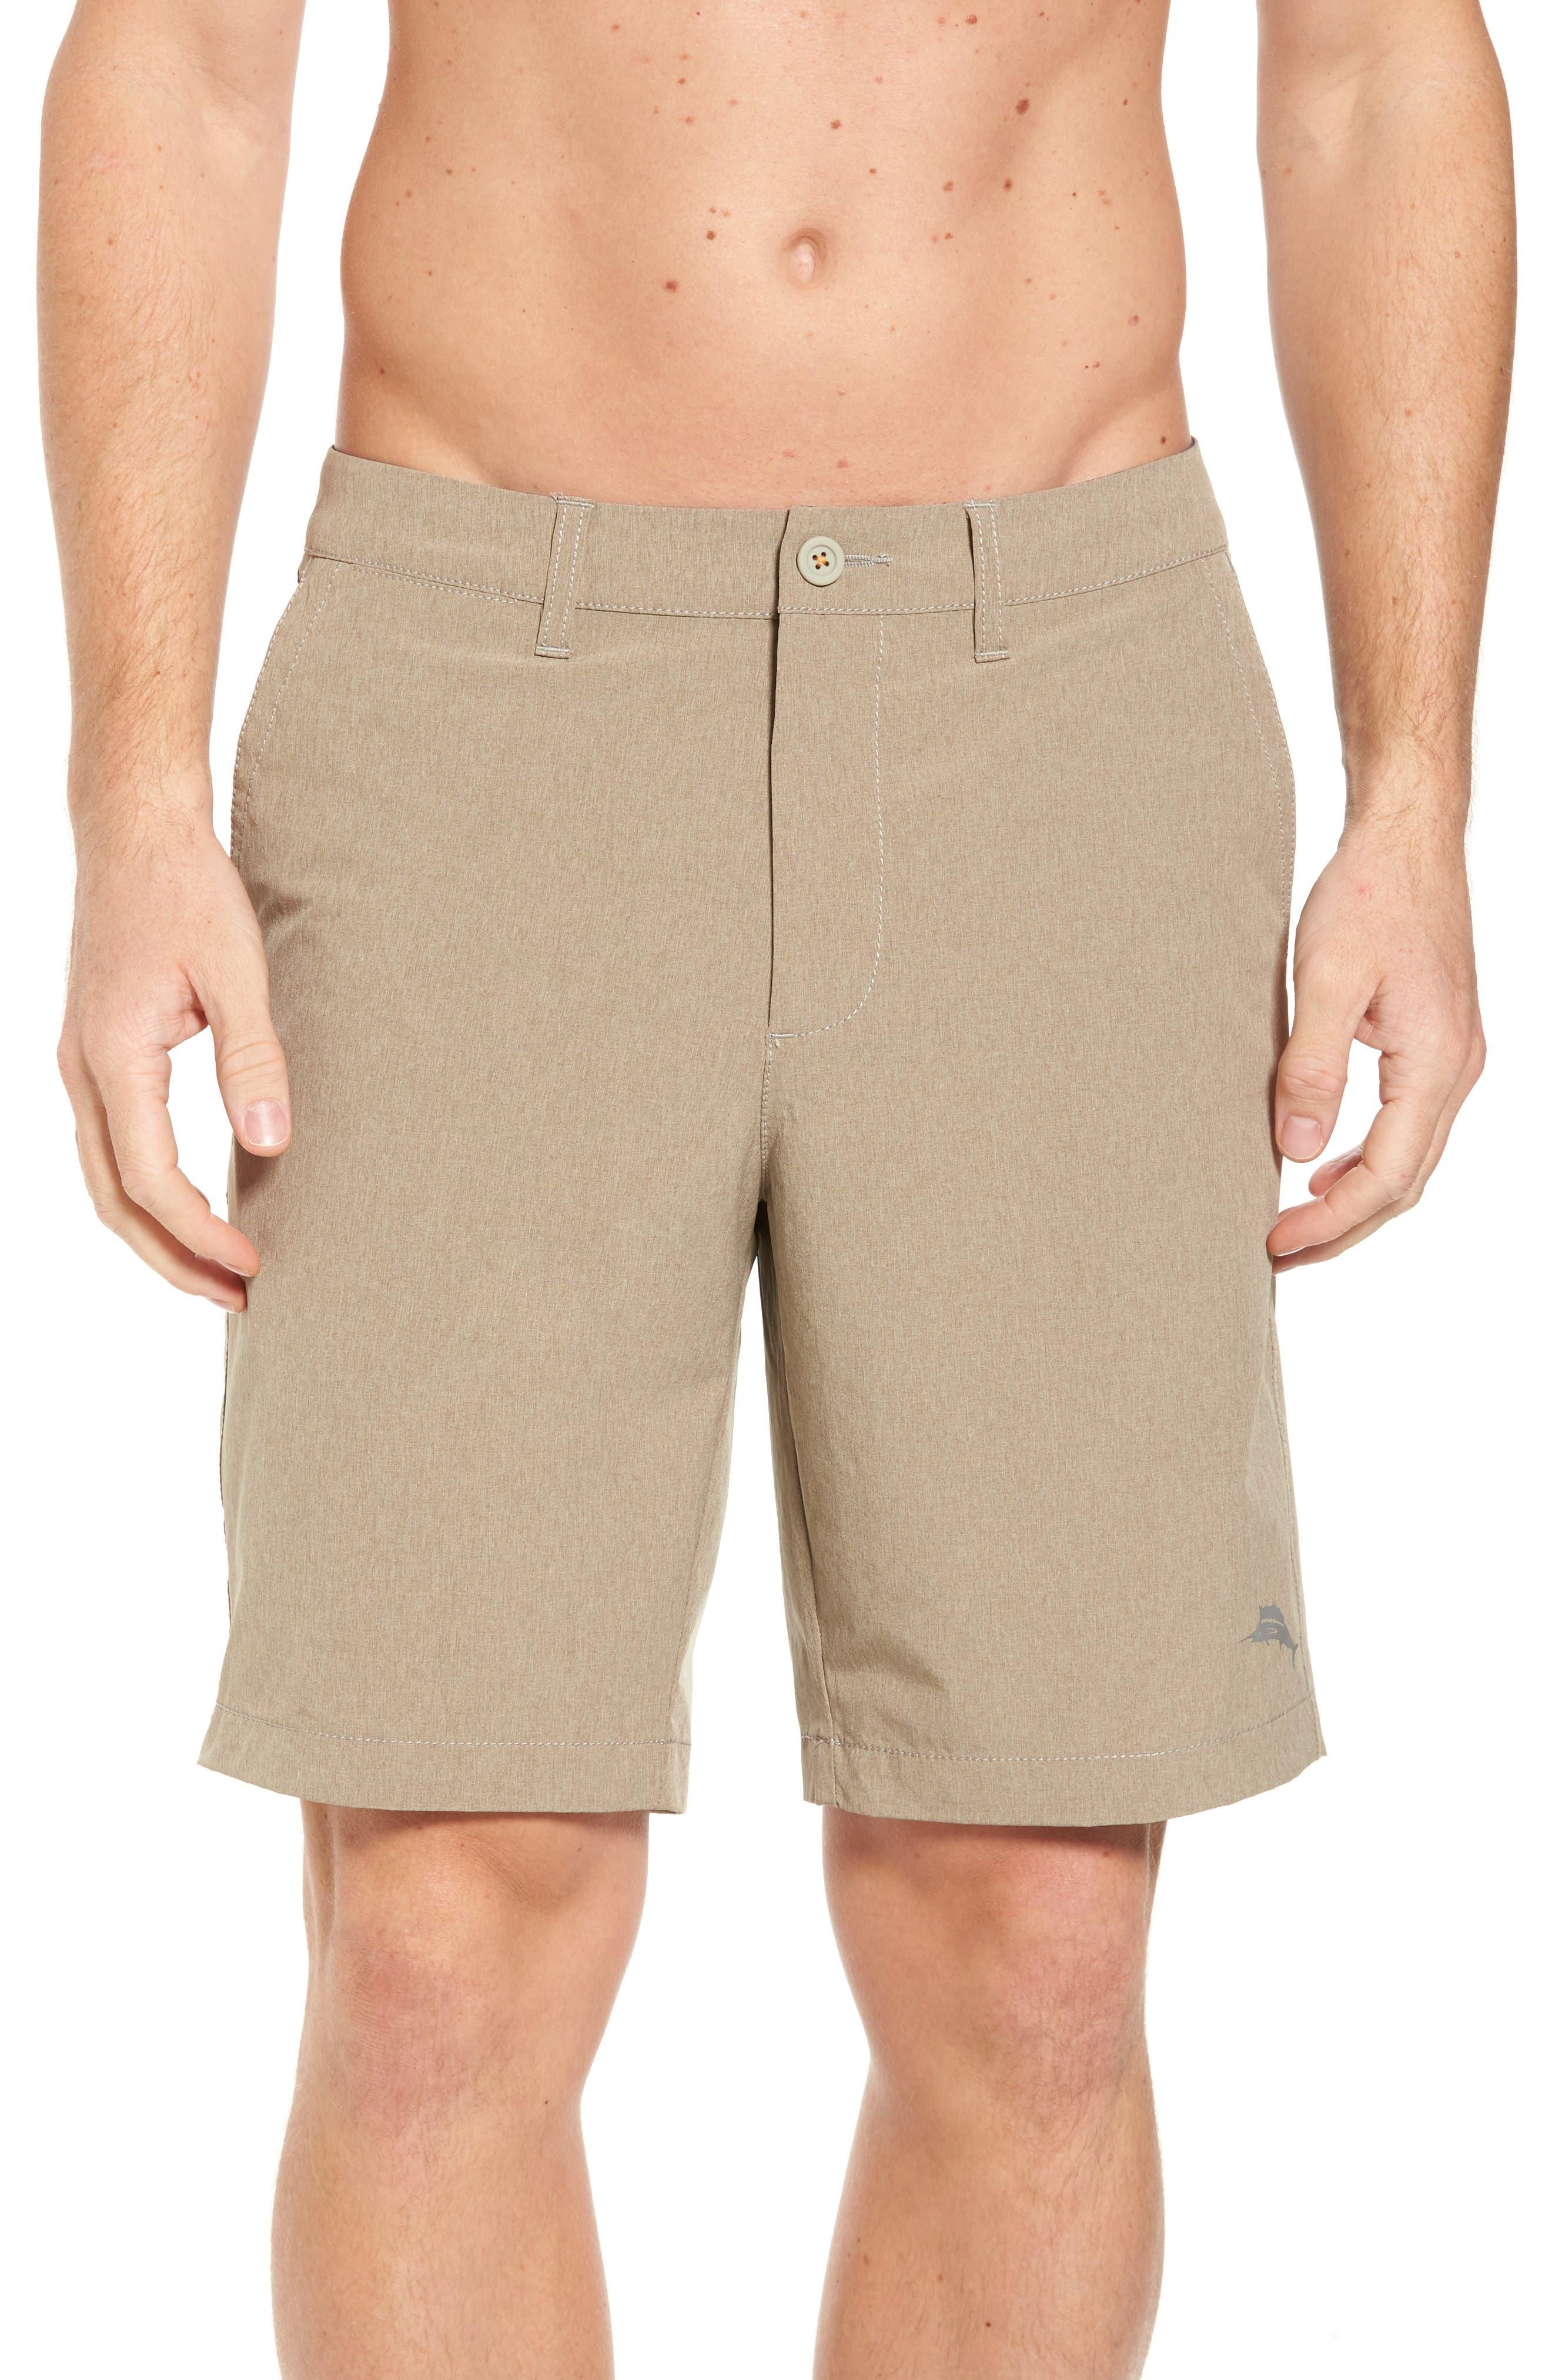 'Cayman Isles' Hybrid Swim Shorts,                             Main thumbnail 1, color,                             Dark Twill